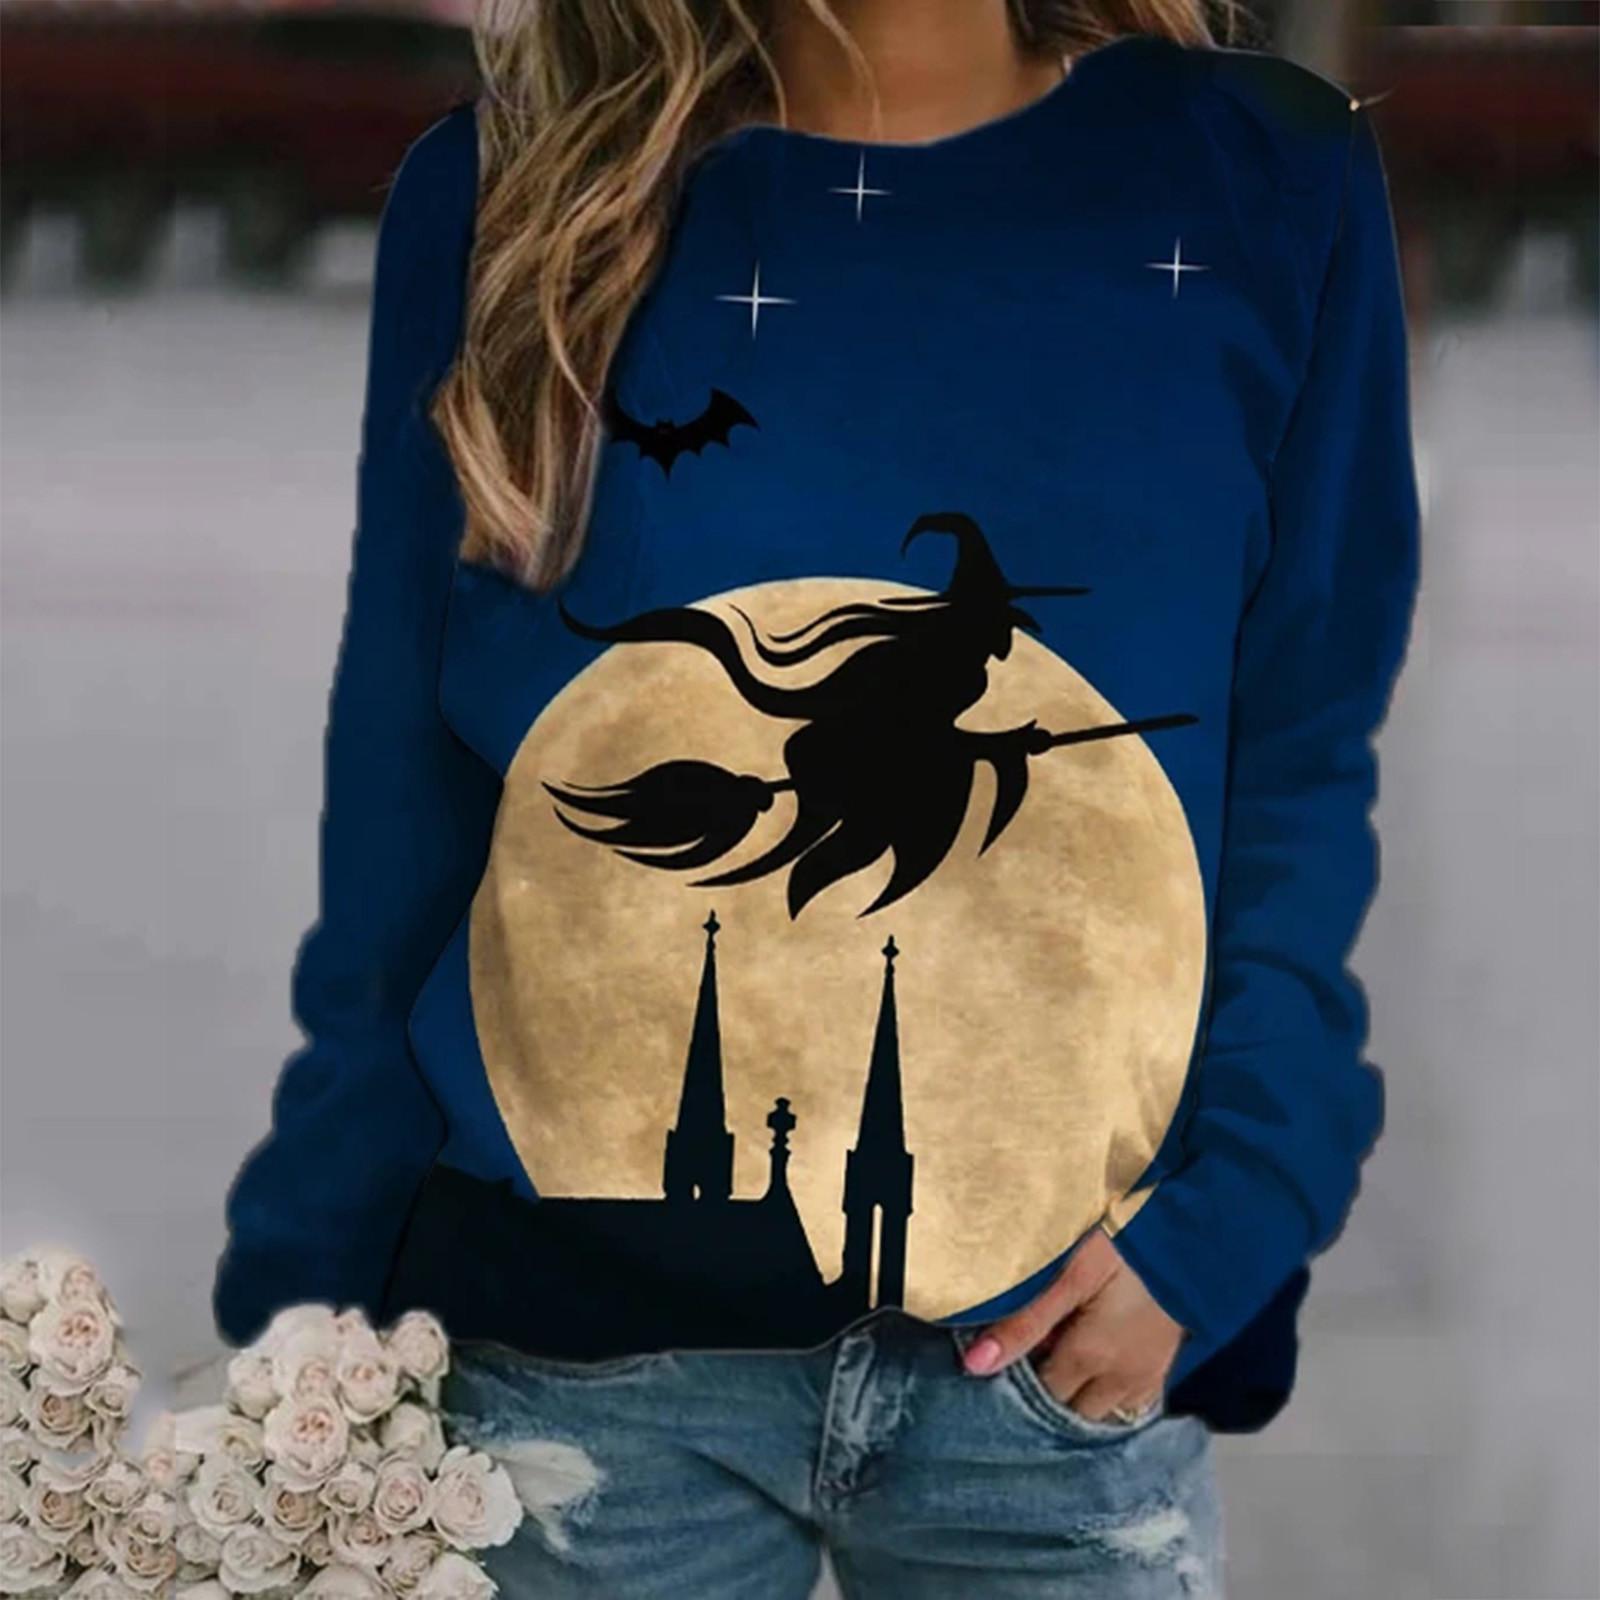 Witch Printing Tops & Tees Women's Casual Print Sweatshirts Thermal Crewne Long Sleeve T-shirts Loose Com Kadn T-shirt